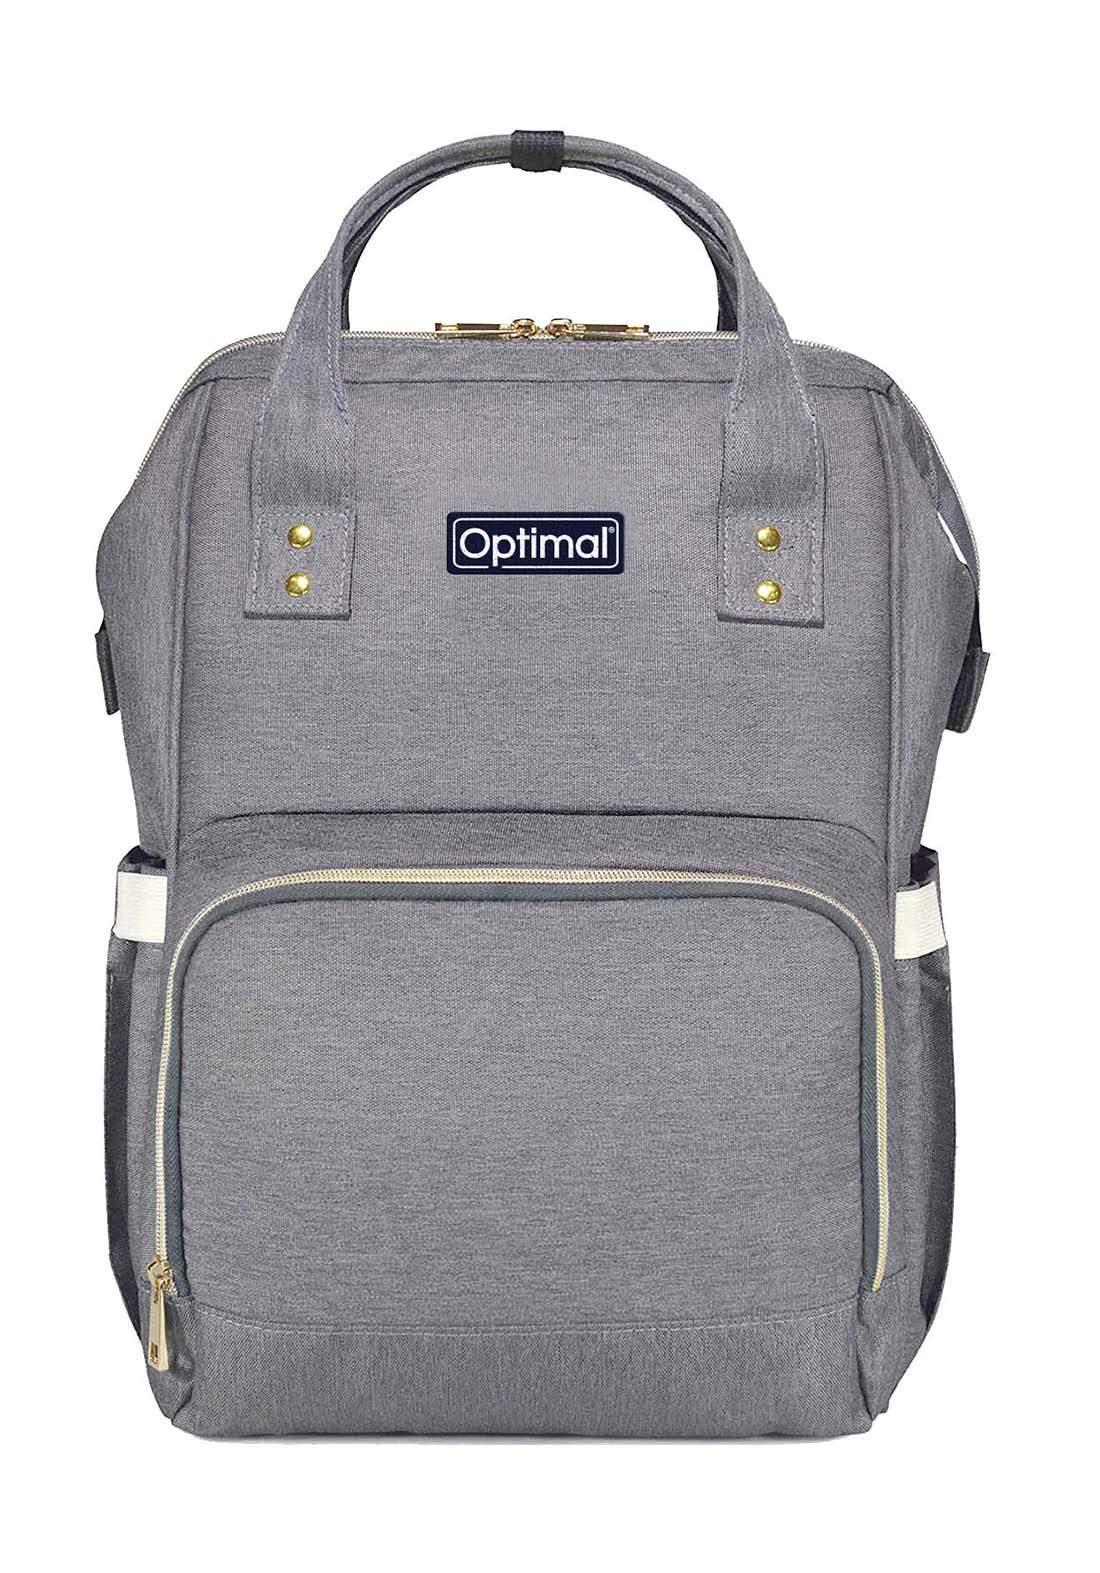 Optimal Mom And Baby Backpack حقيبة ظهر لمستلزمات الطفل والام